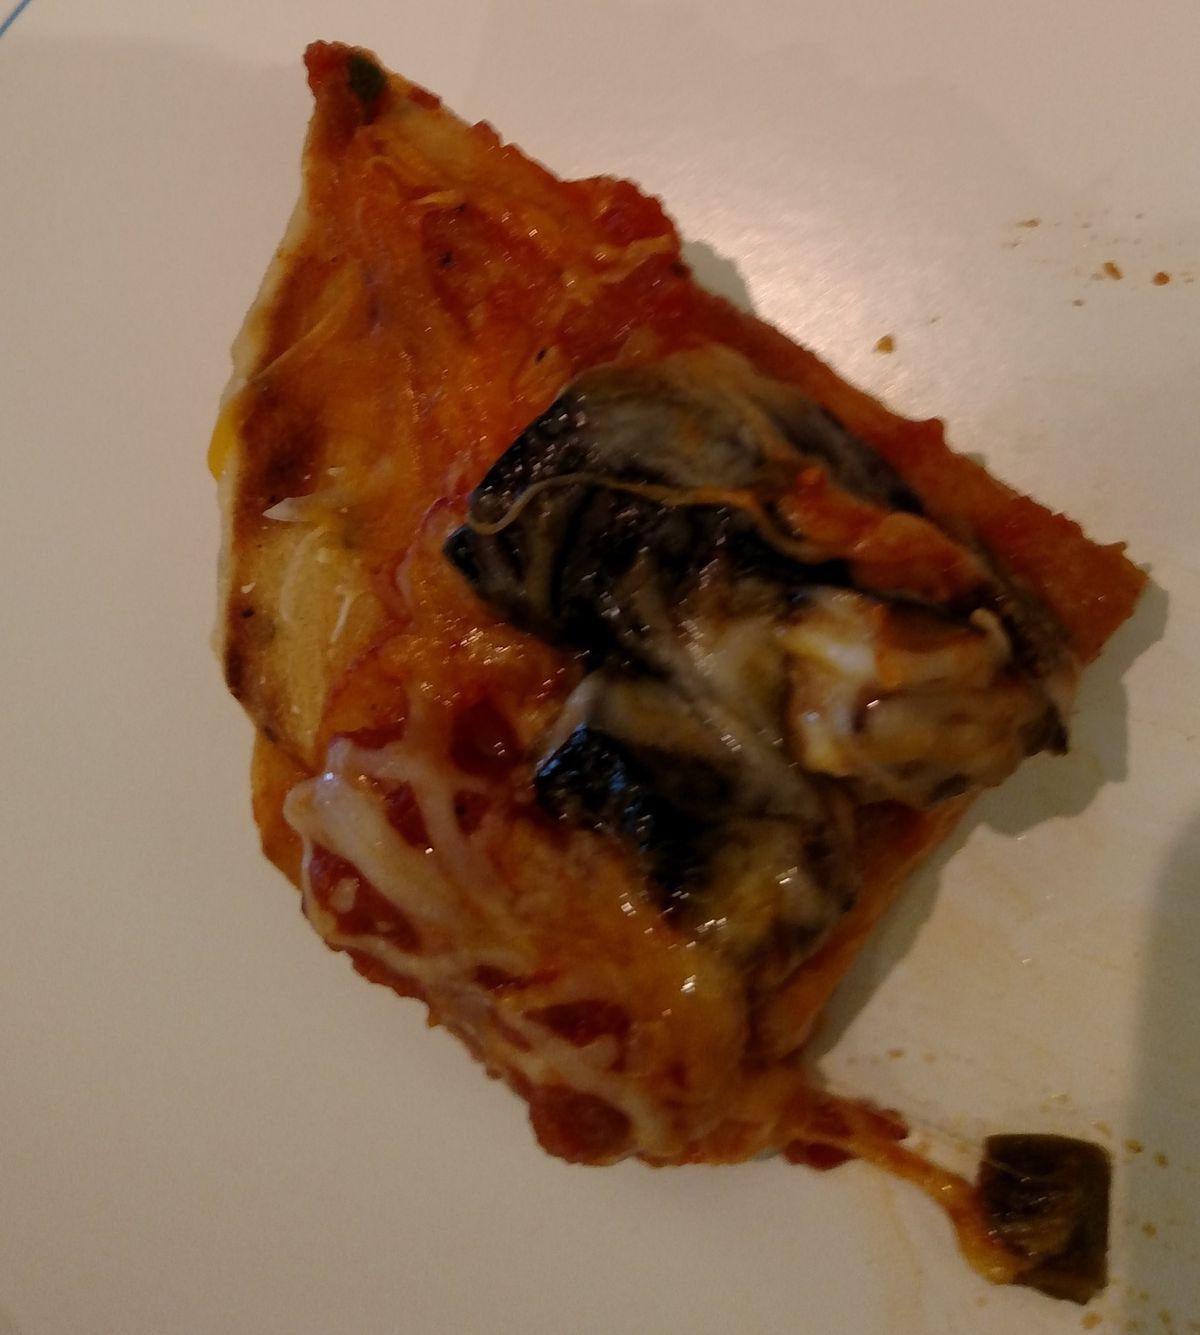 Pheasant pizza by John Hennessy.<br>Dale Bowman/Sun-Times